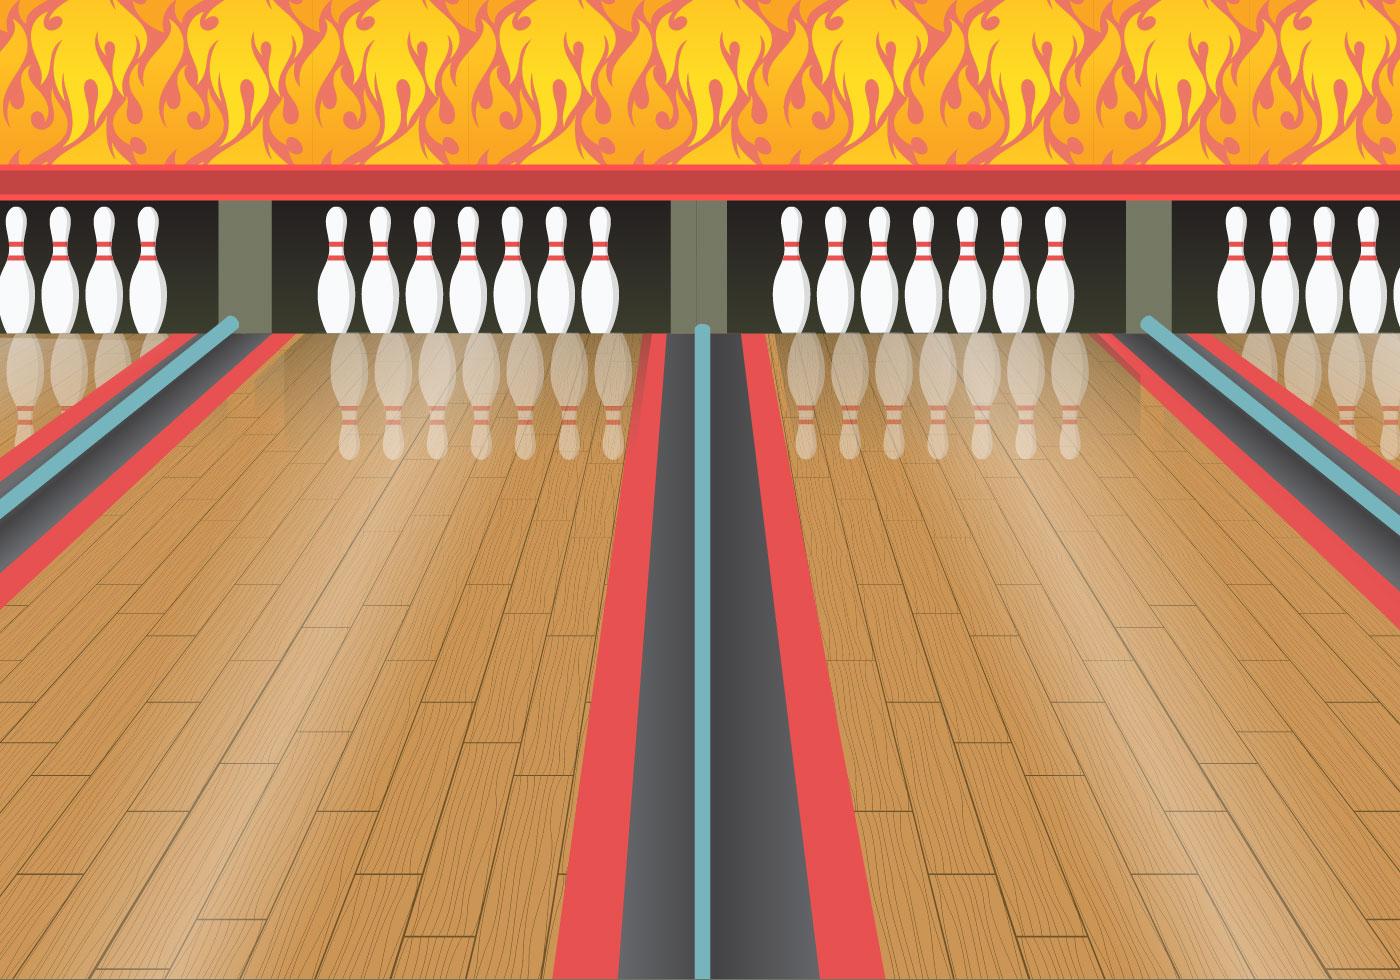 bowling pin images free